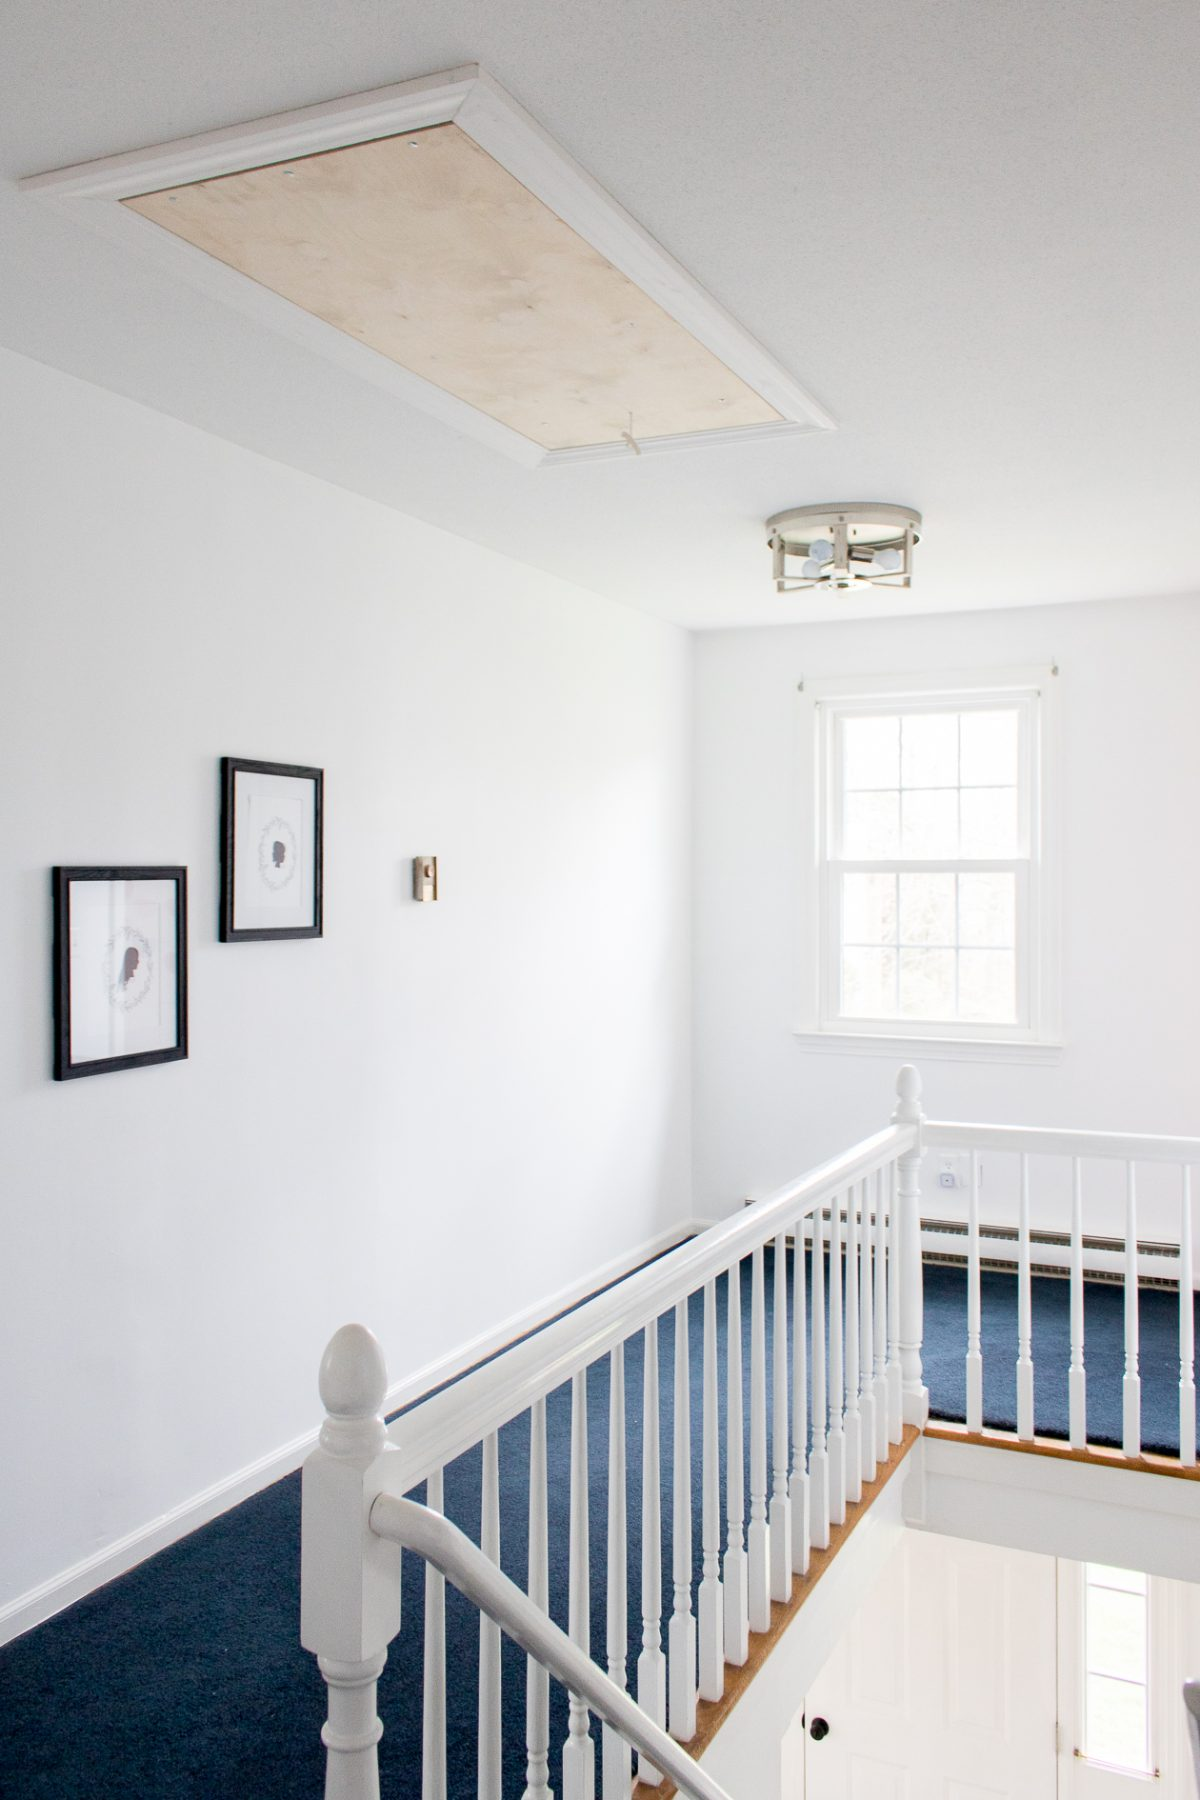 Peyton 3 Light Flush Mount in Upstairs Hallway